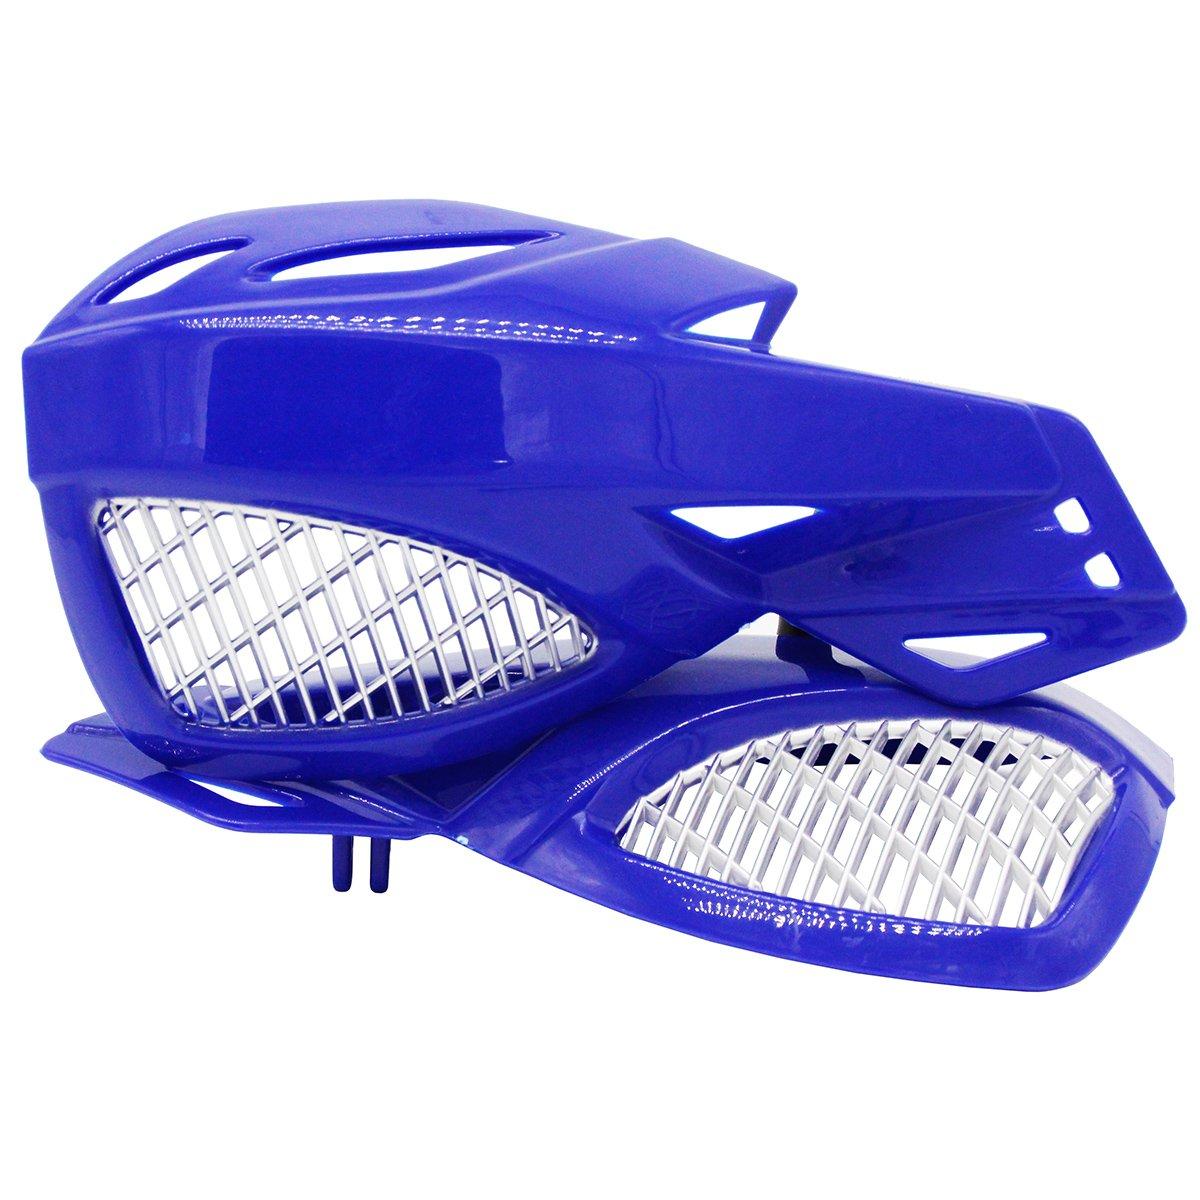 Lozom 7/8'' Motorcycle Handguards Handlebar Hand Guards Brush Bar Protector For Motocross Supermoto Racing Dirt Bike ATV (Blue)